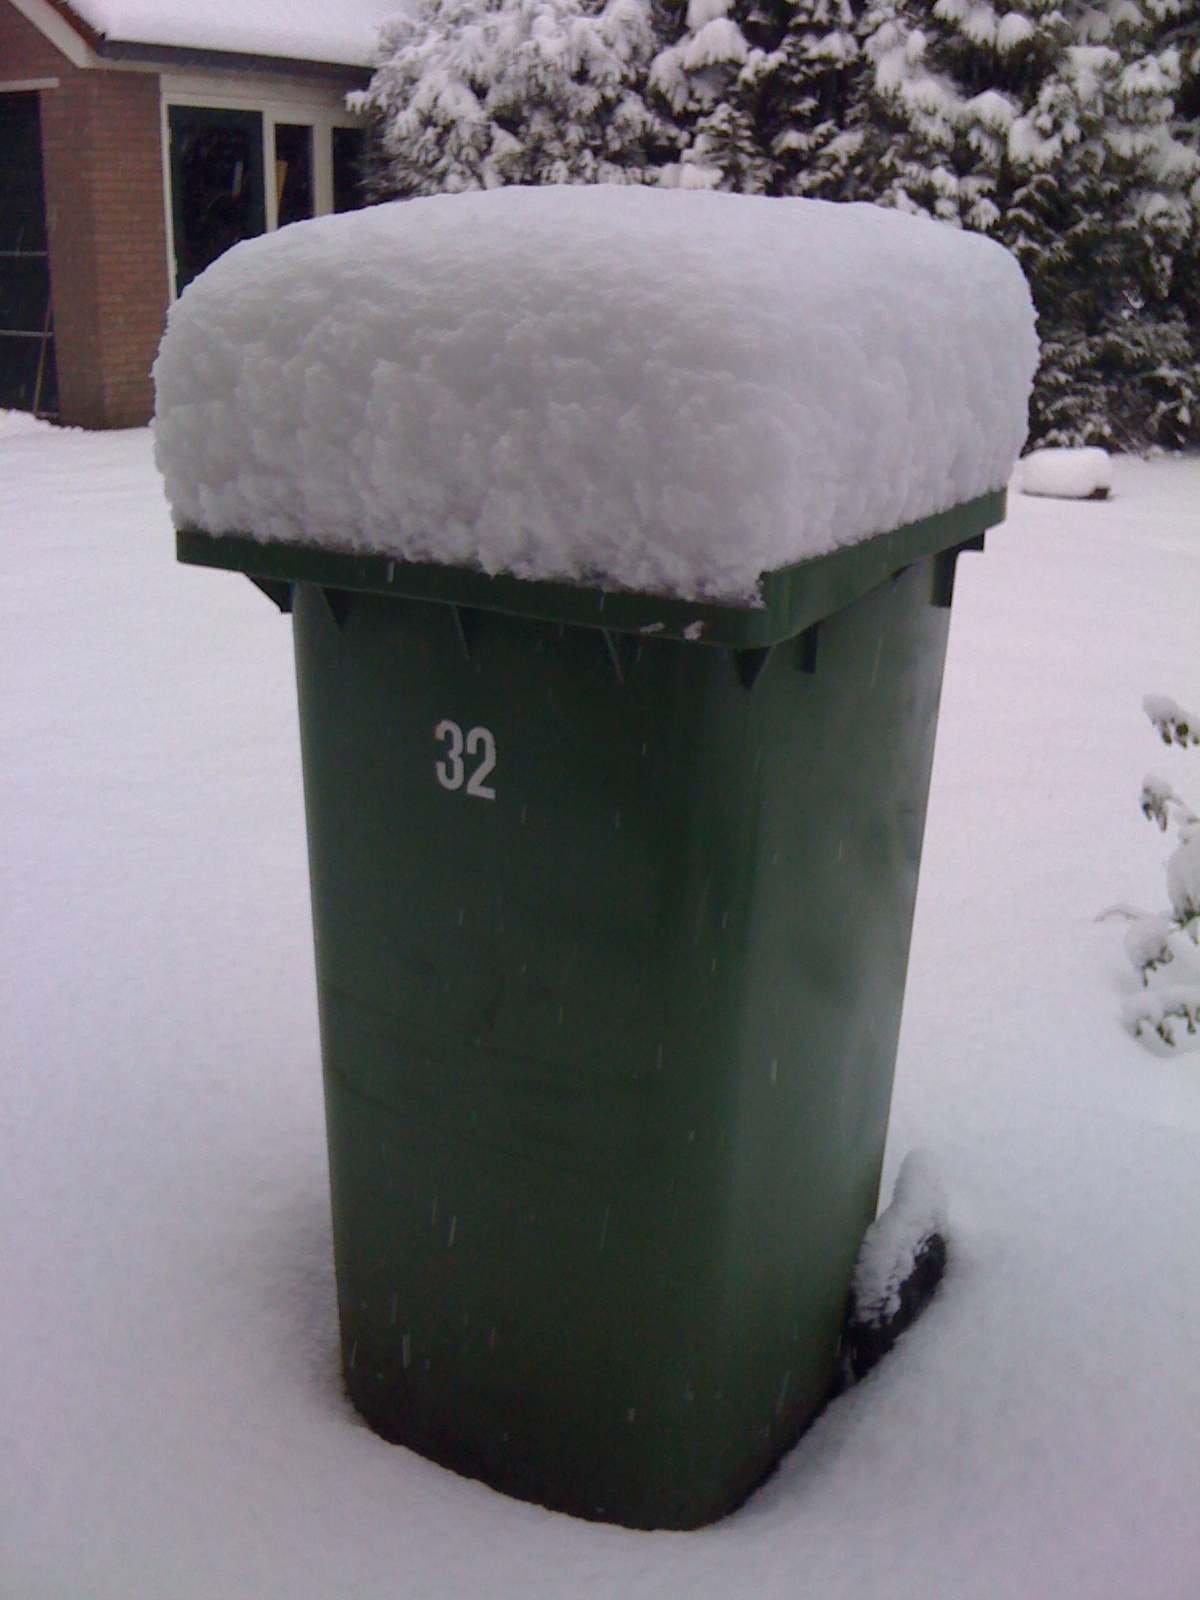 Green bin with snow